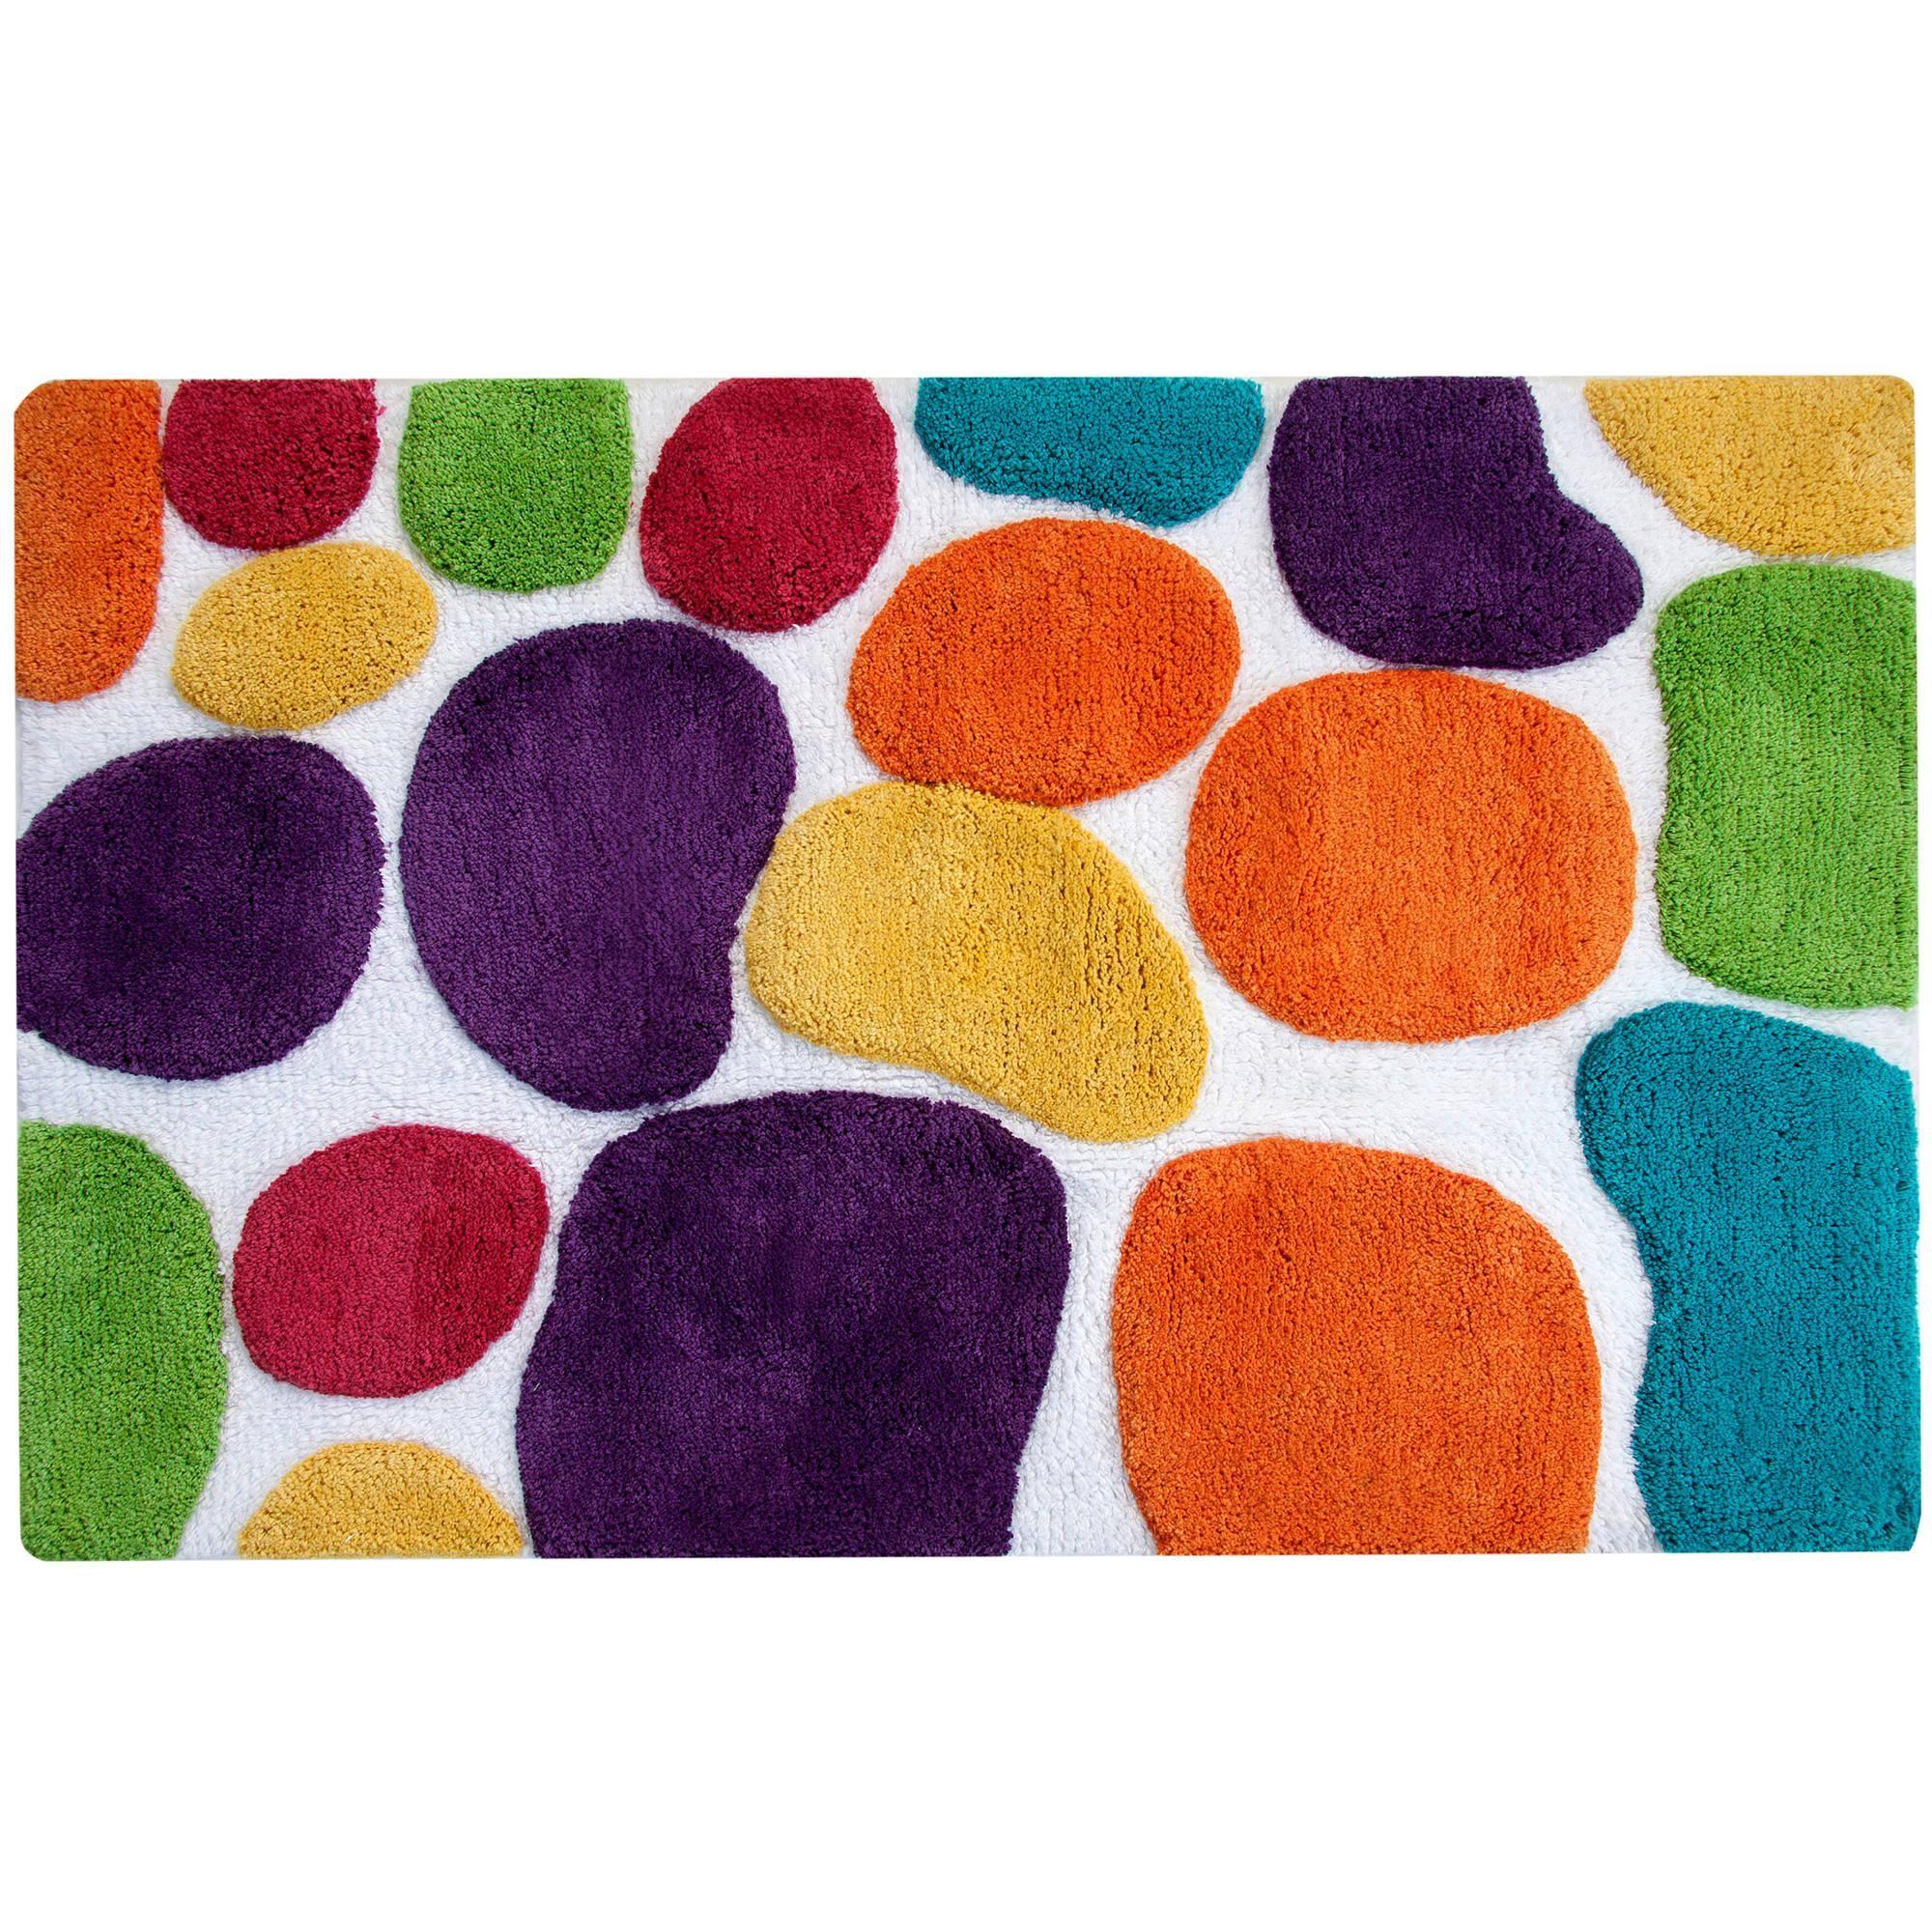 Chesapeake Pebbles Brights Multi Coloured Bath Runner 24 X 36 Walmart Com Colorful Bath Bath Runner Pattern Bath Rugs [ 2000 x 2000 Pixel ]